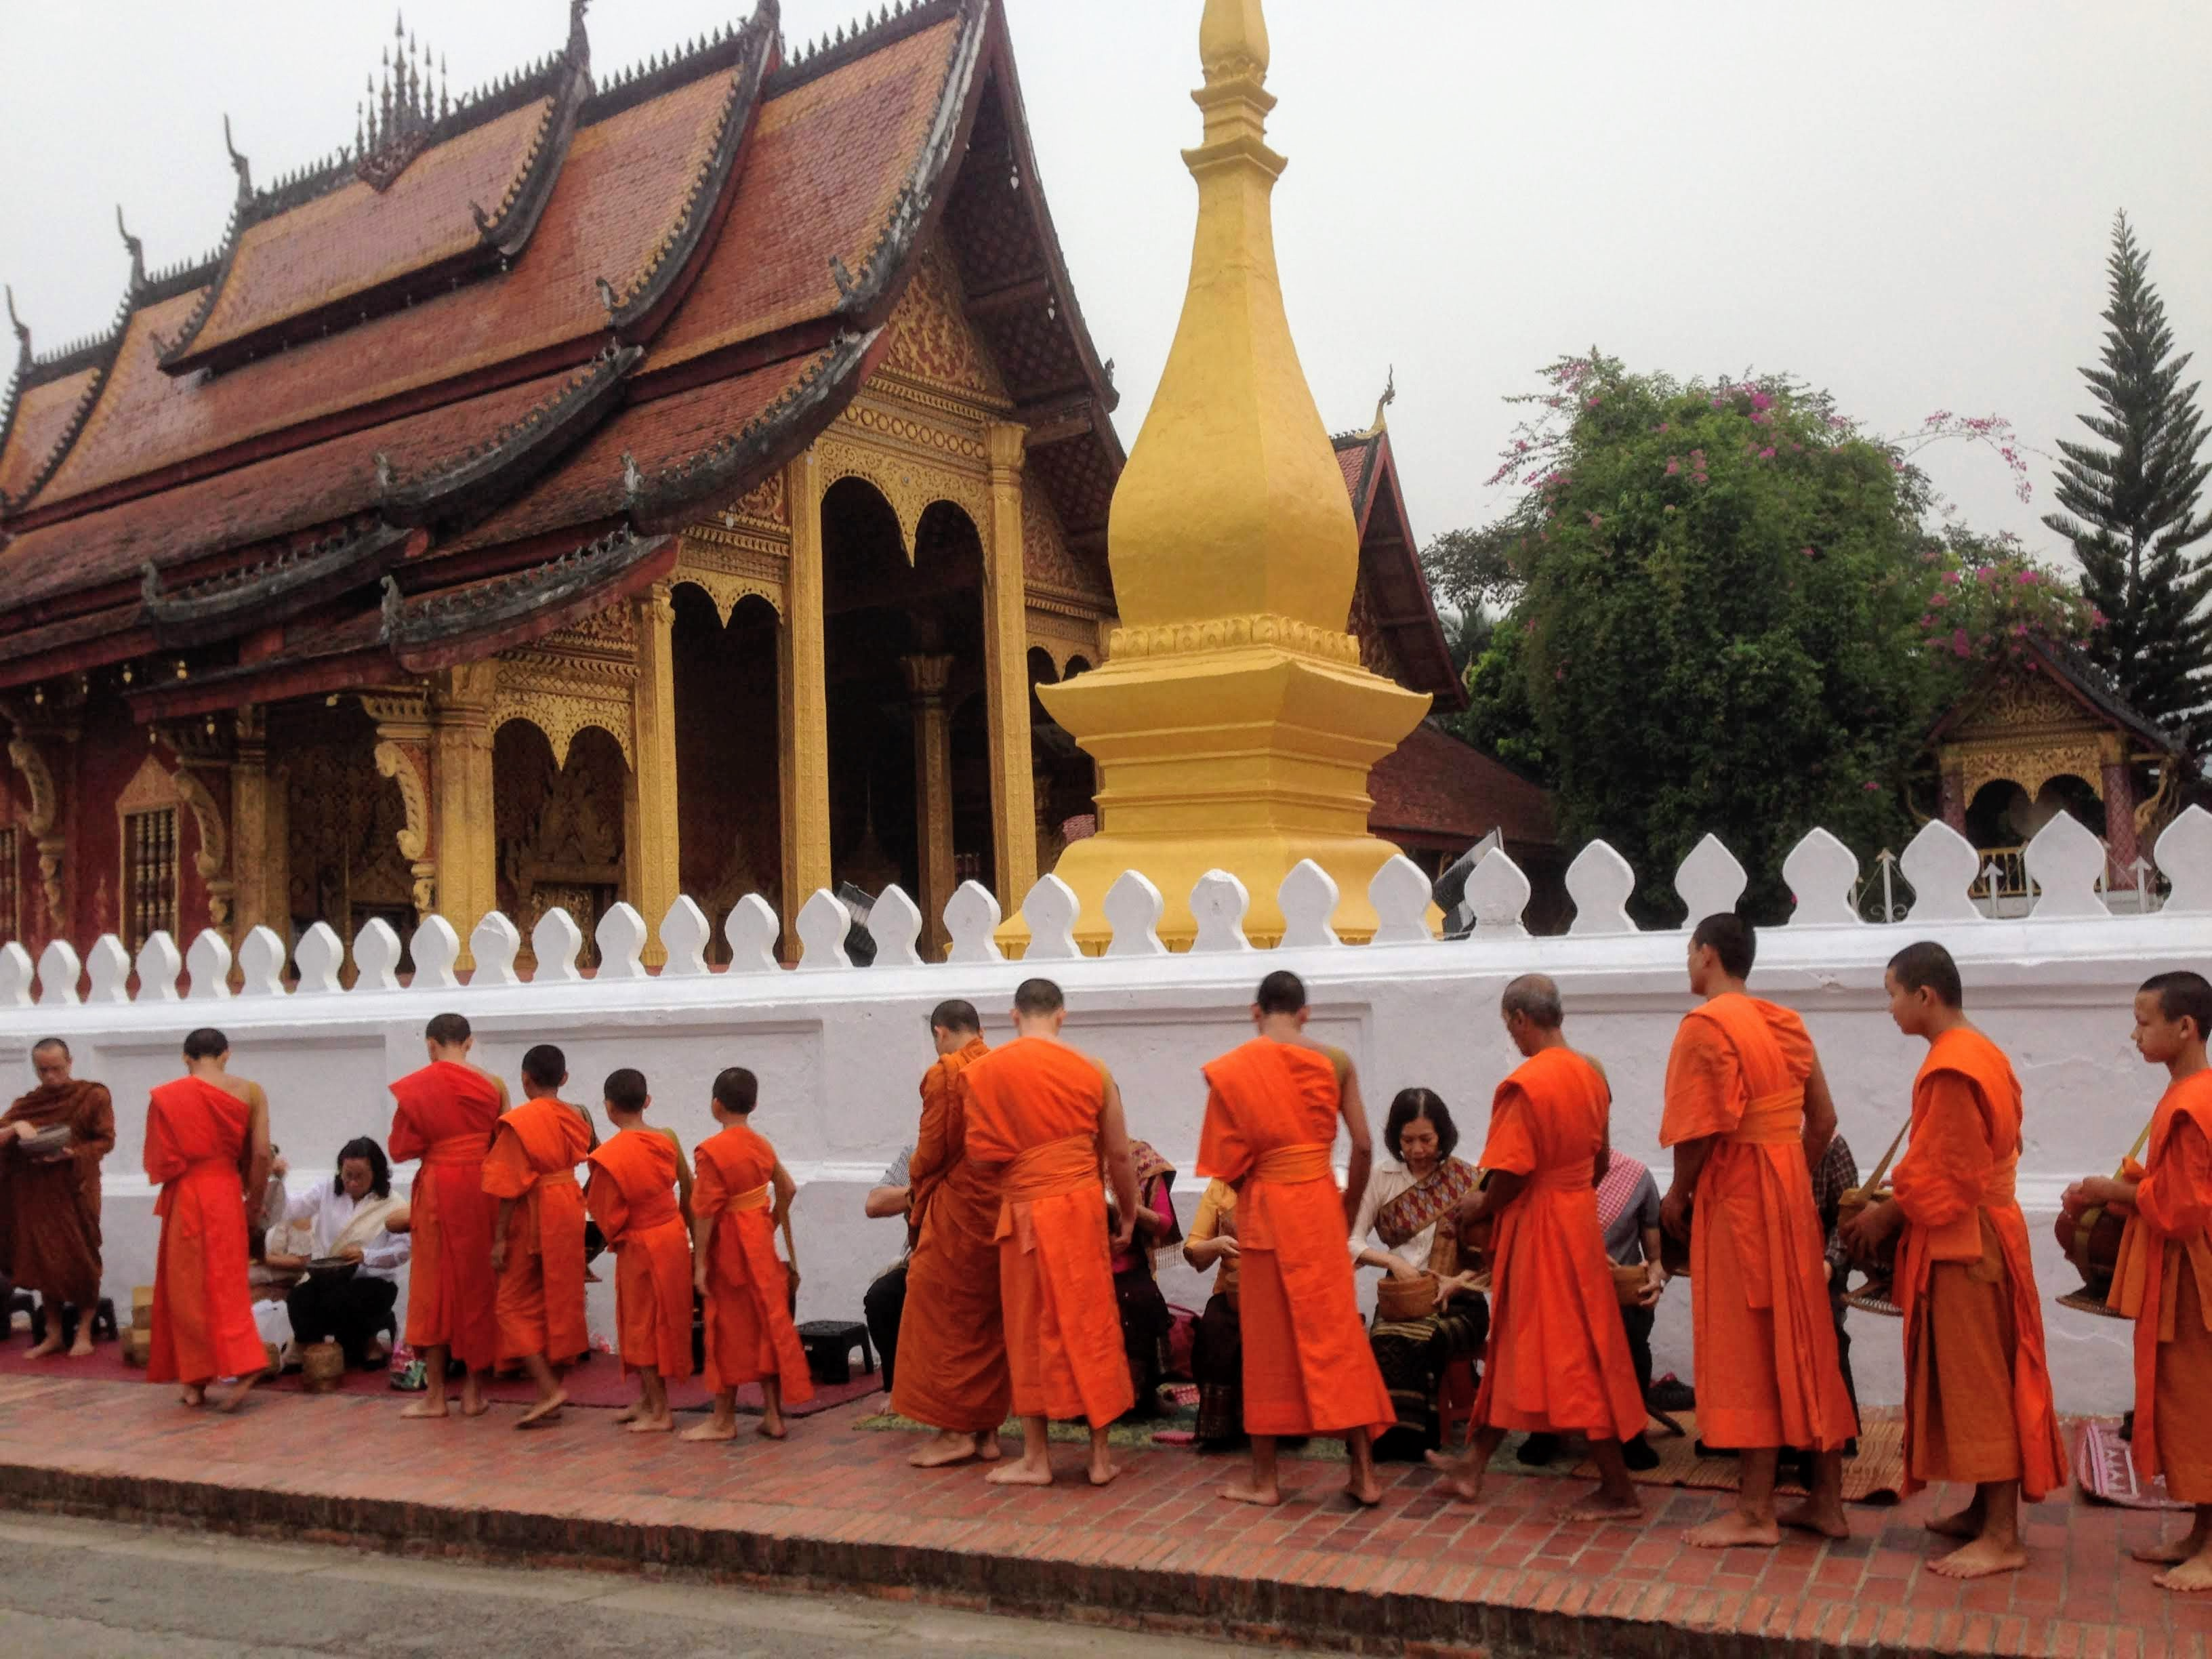 Luang Prabang Laos Buddhist alms ceremony